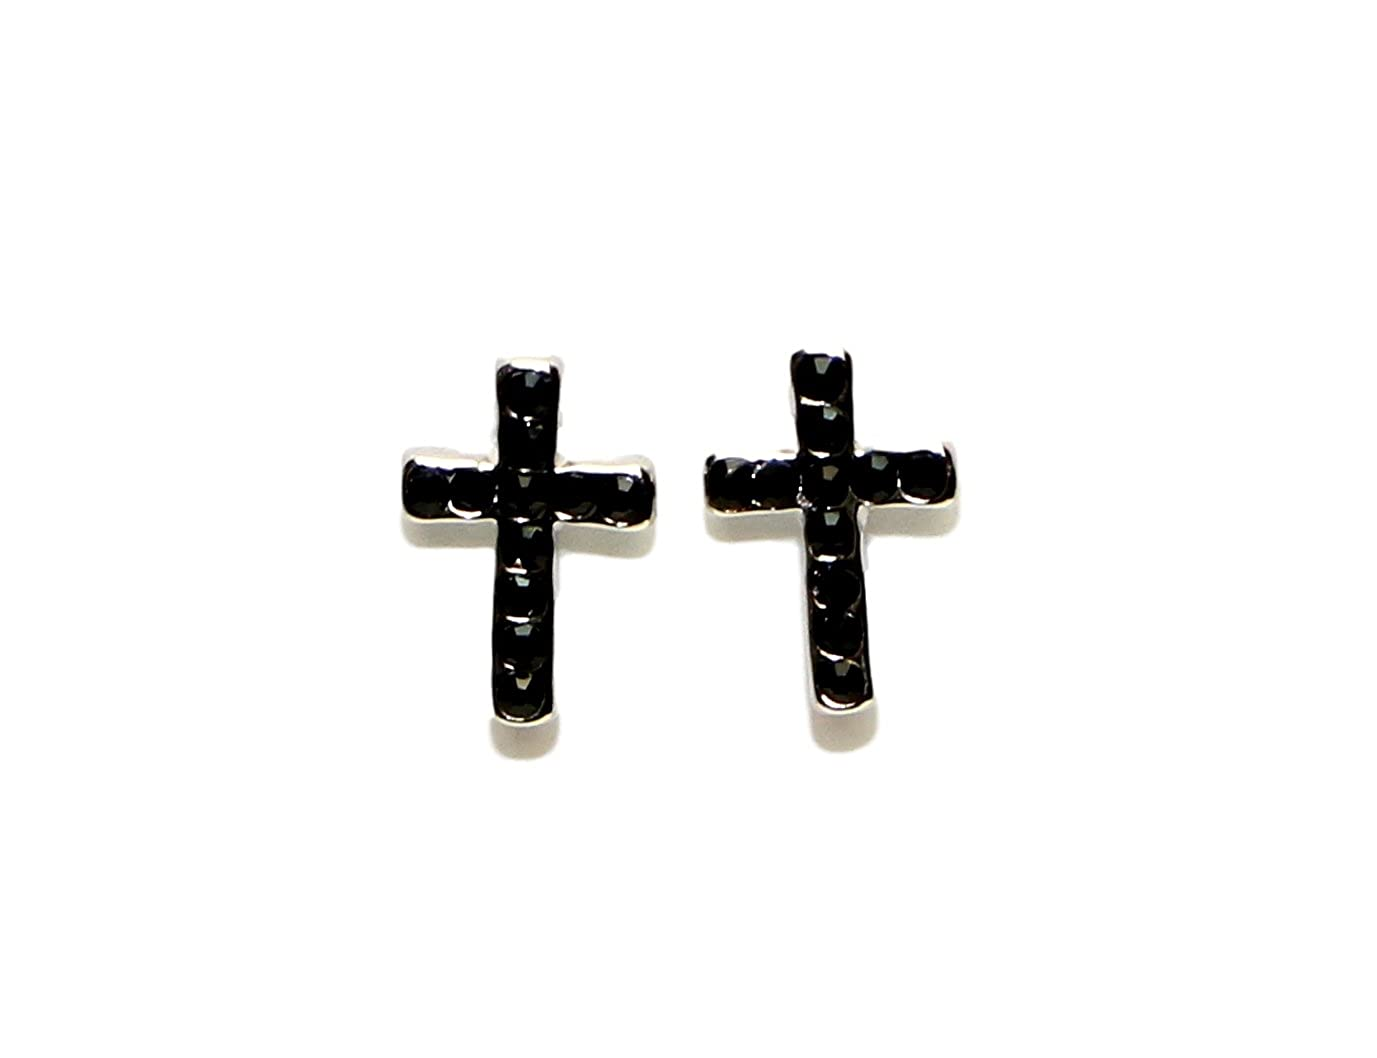 Surgical Stainless Steel Studs Earrings Cross Cubic Zirconia Hypoallergenic Earrings